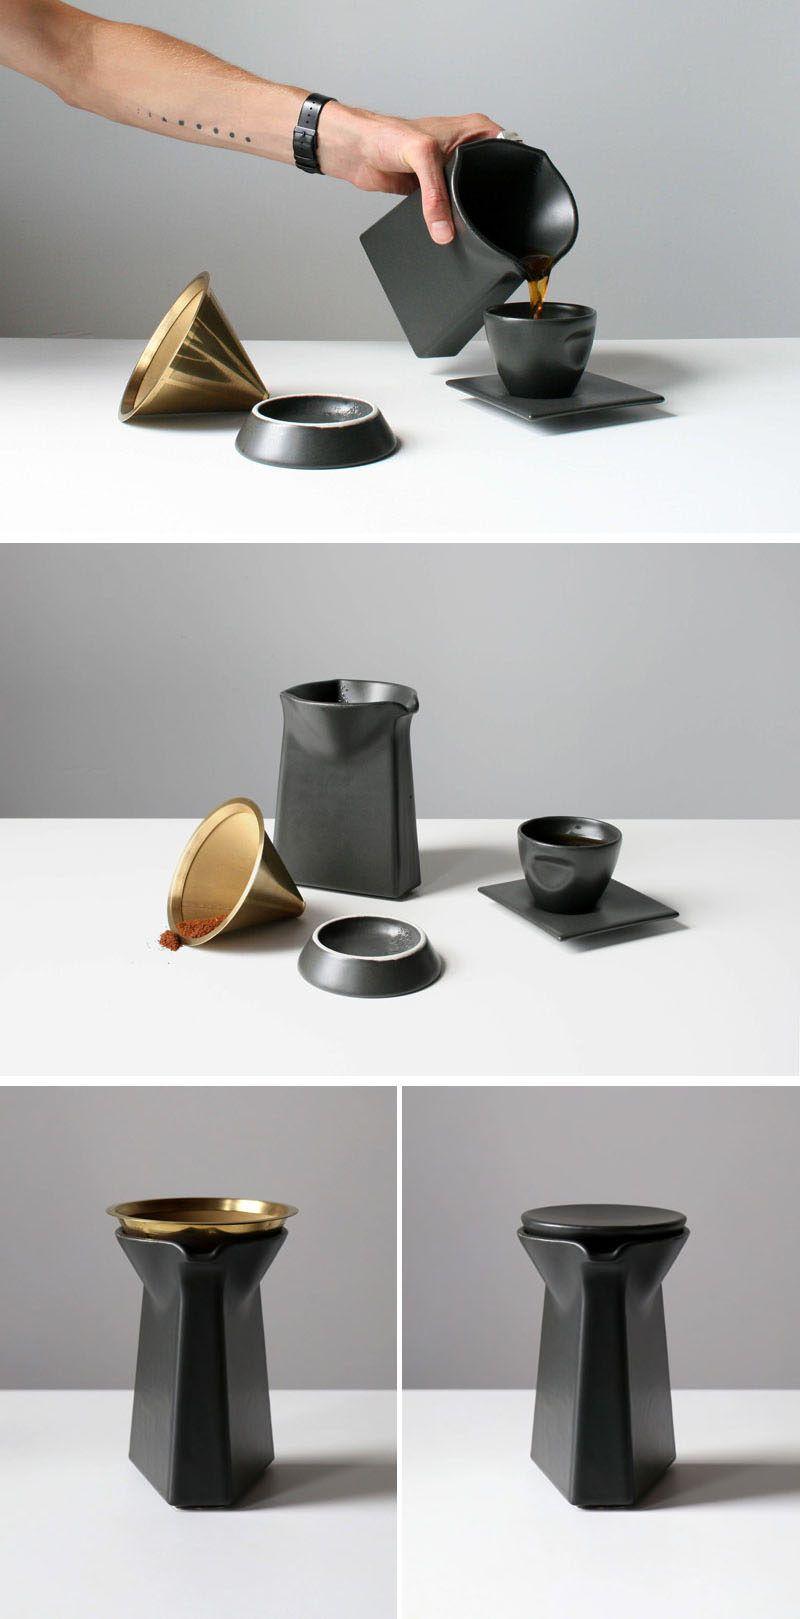 Daniel Kamp Has Designed A Minimalist Pour Over Coffee Brewer